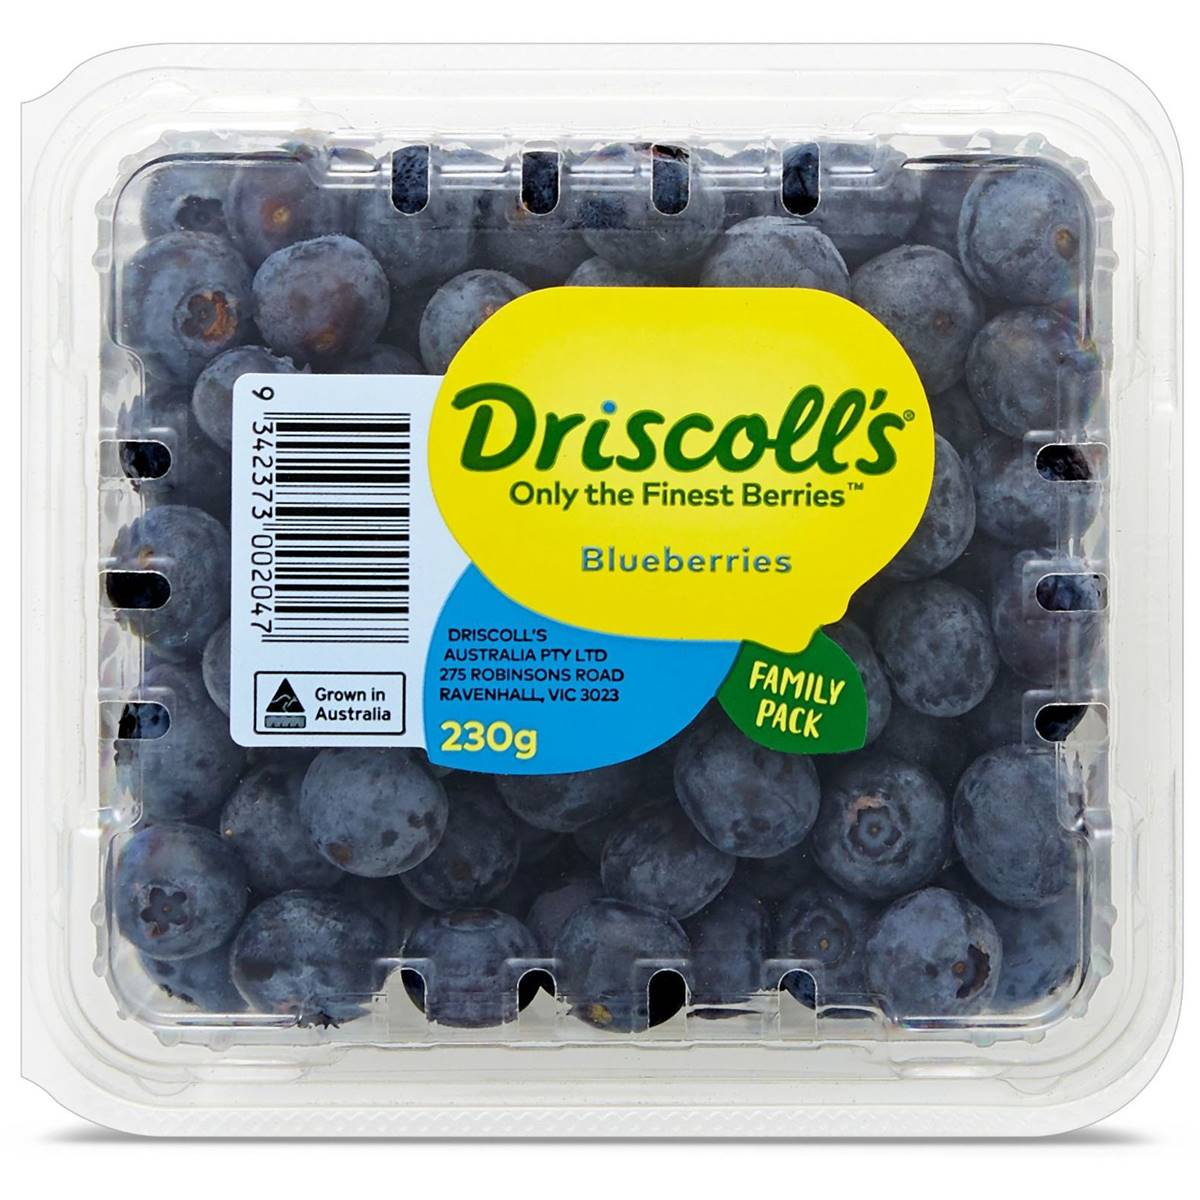 Driscoll's Fresh Blueberries